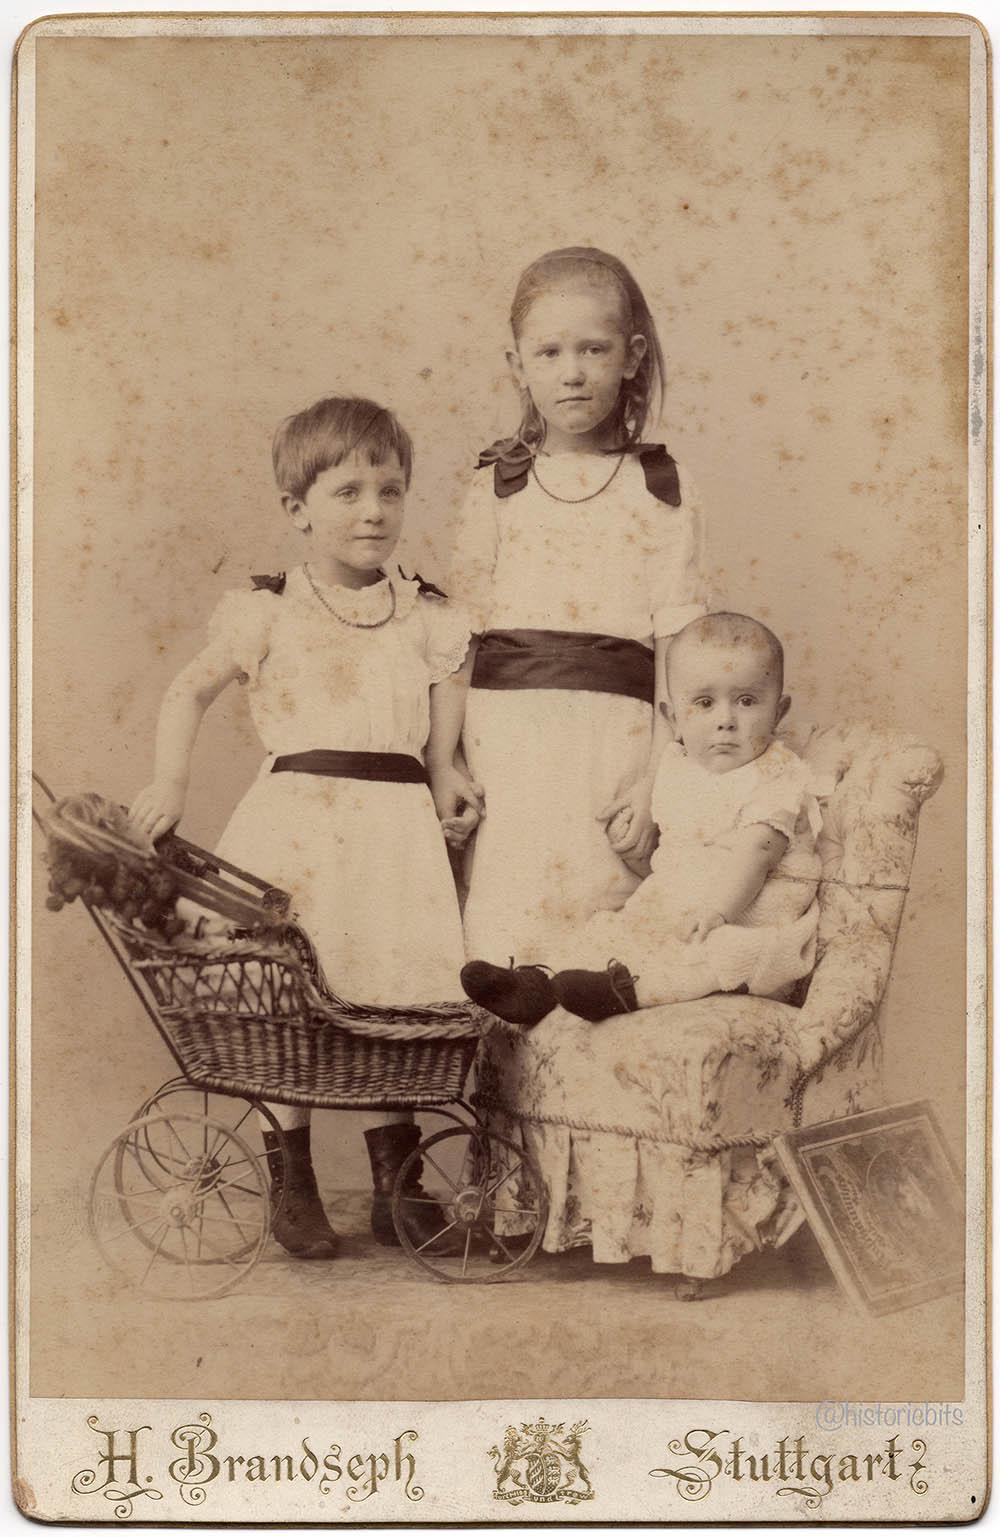 brandseph,c.1870